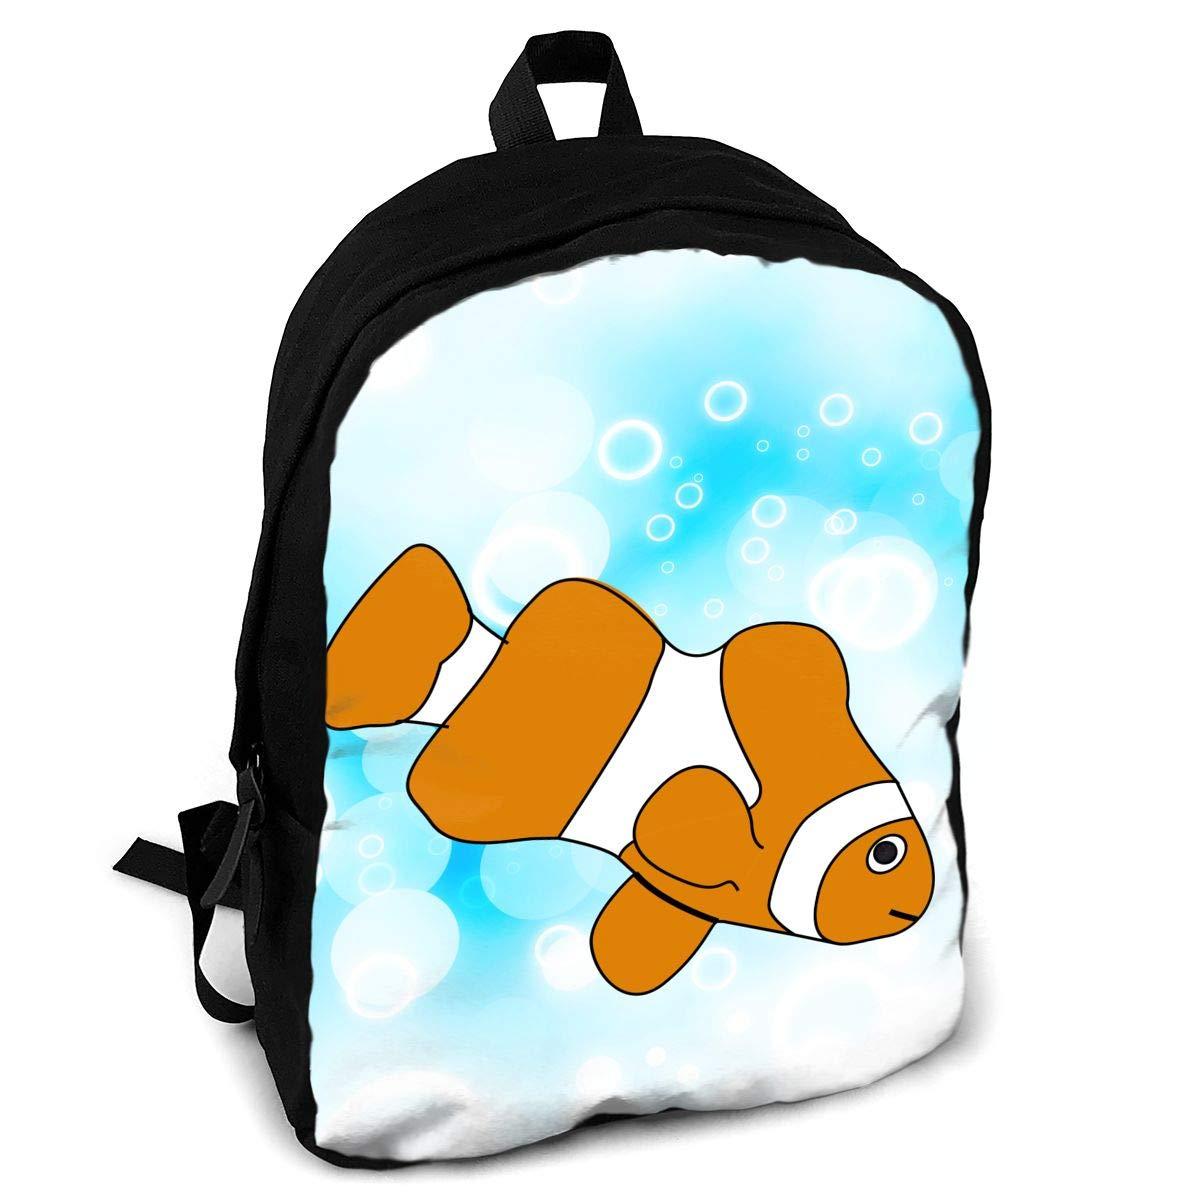 Backpack clipart knapsack. Amazon com clown fish